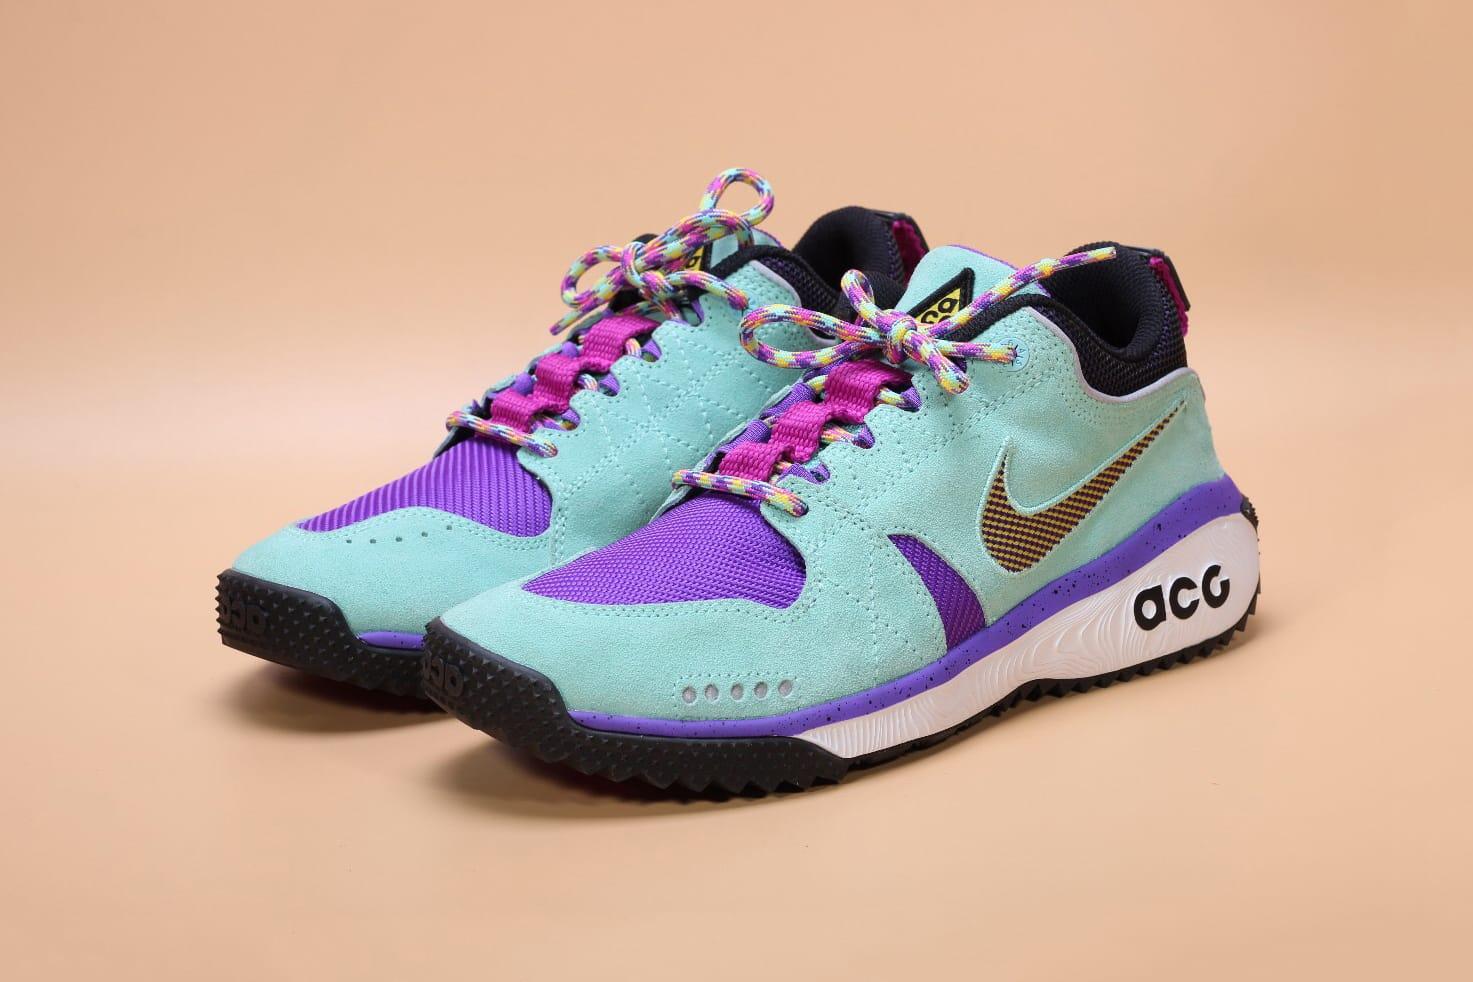 Nike ACG Dog Mountain First Look